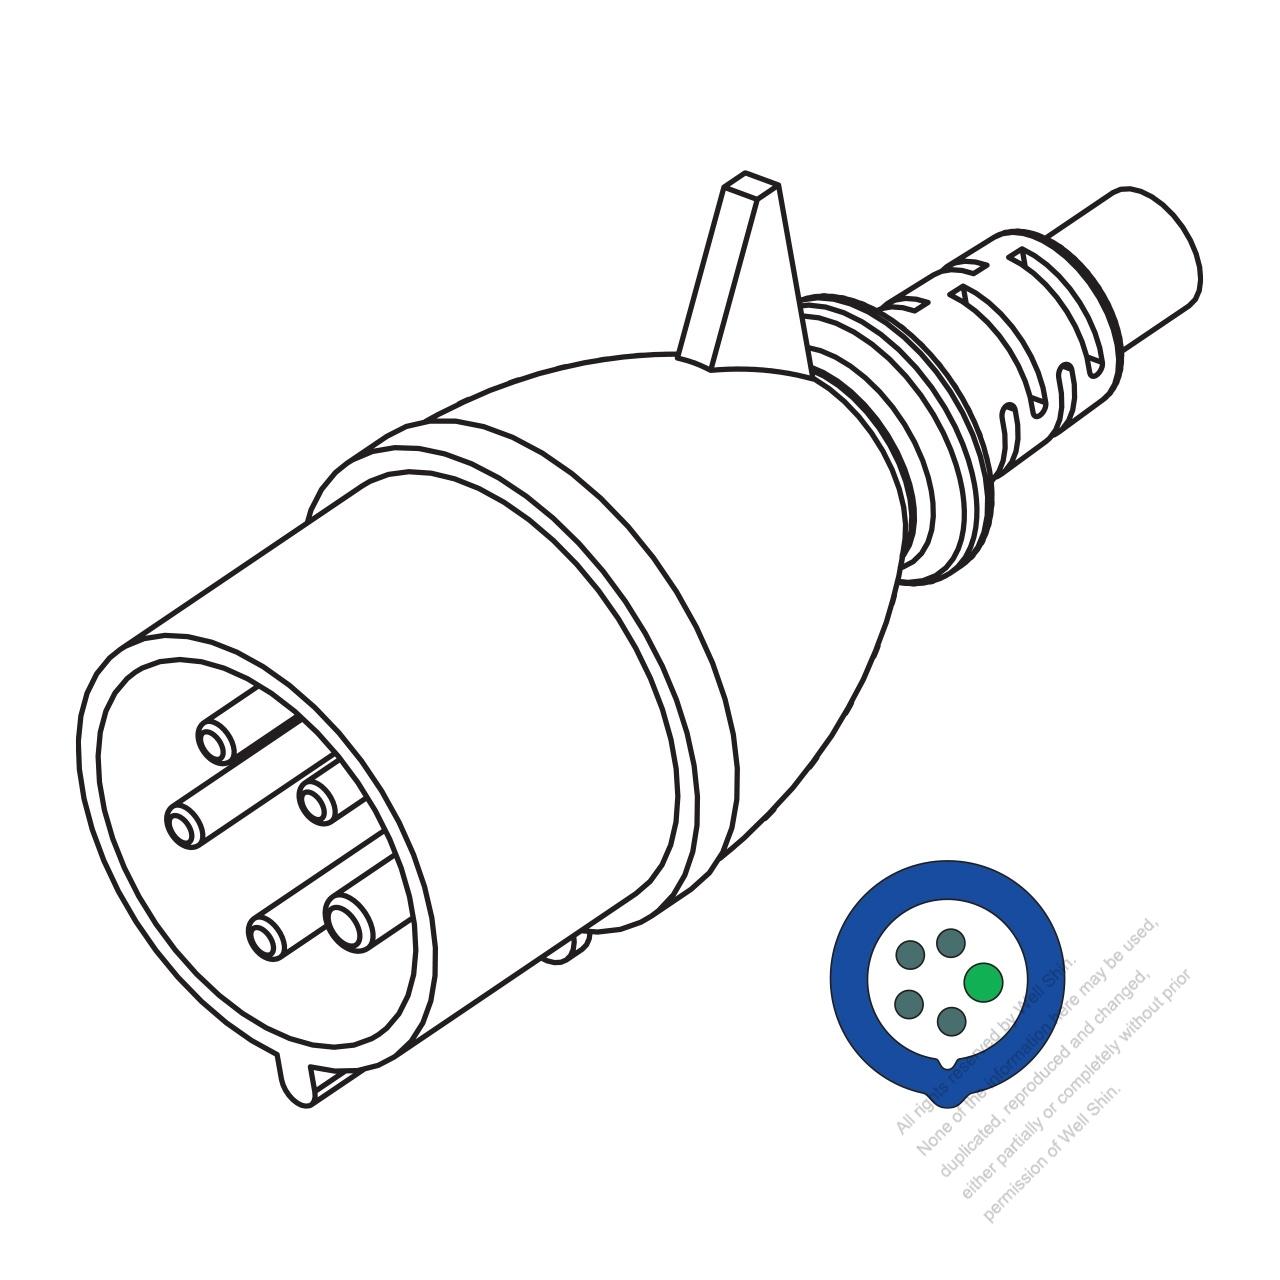 480v plug wiring diagram database 480 Single Phase Wiring iec 309 3p n e ip 44 splash proof ac plug 32a 230v 9h well 480 volt power plugs 480v plug